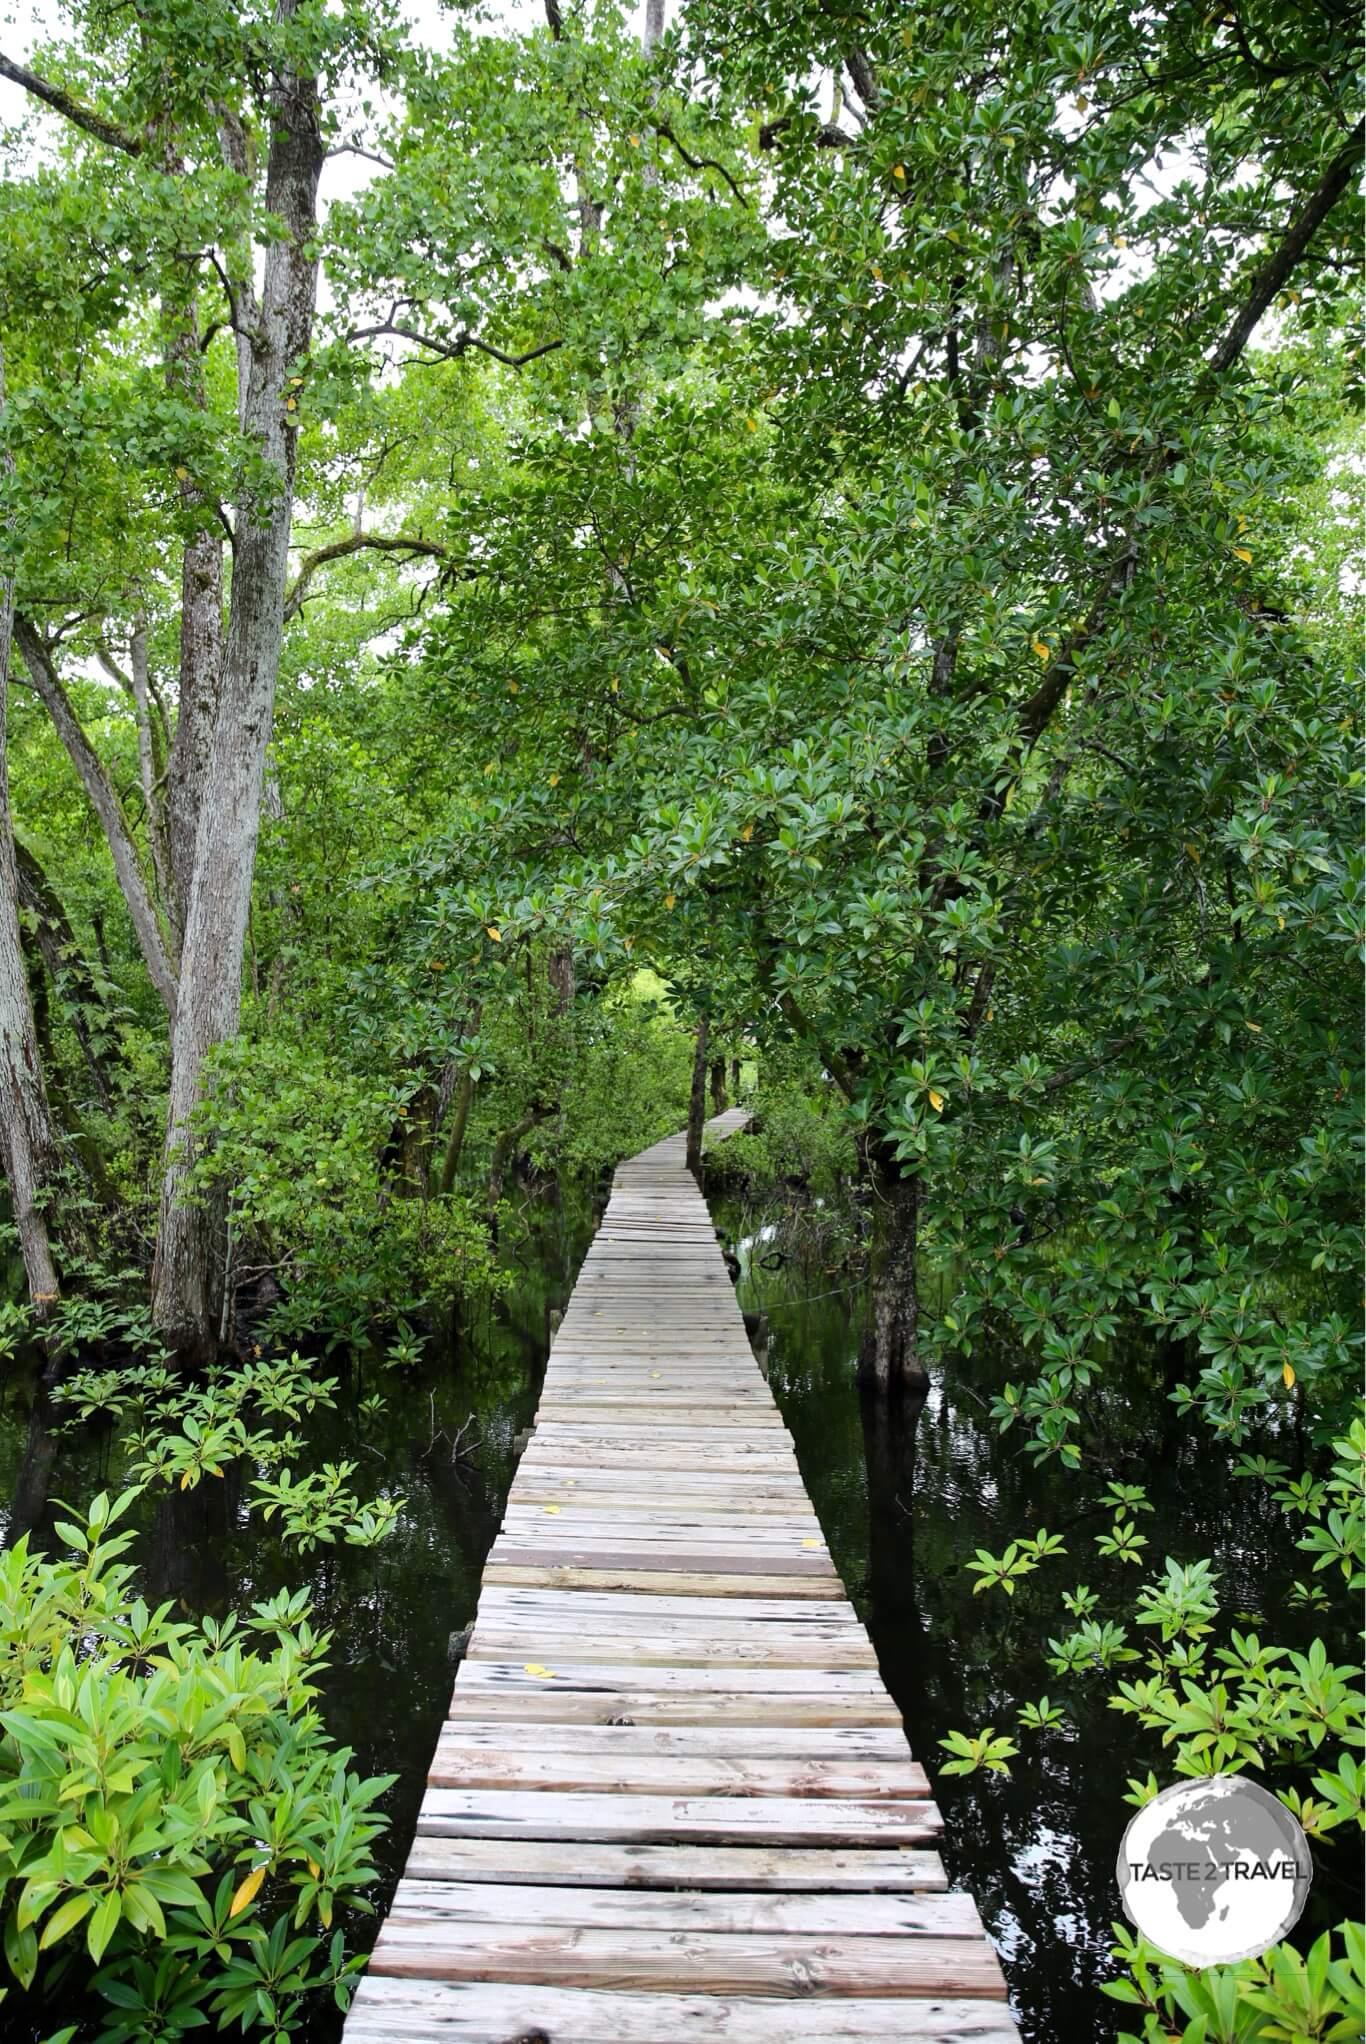 Boardwalk through the mangrove to Bully's Bar.